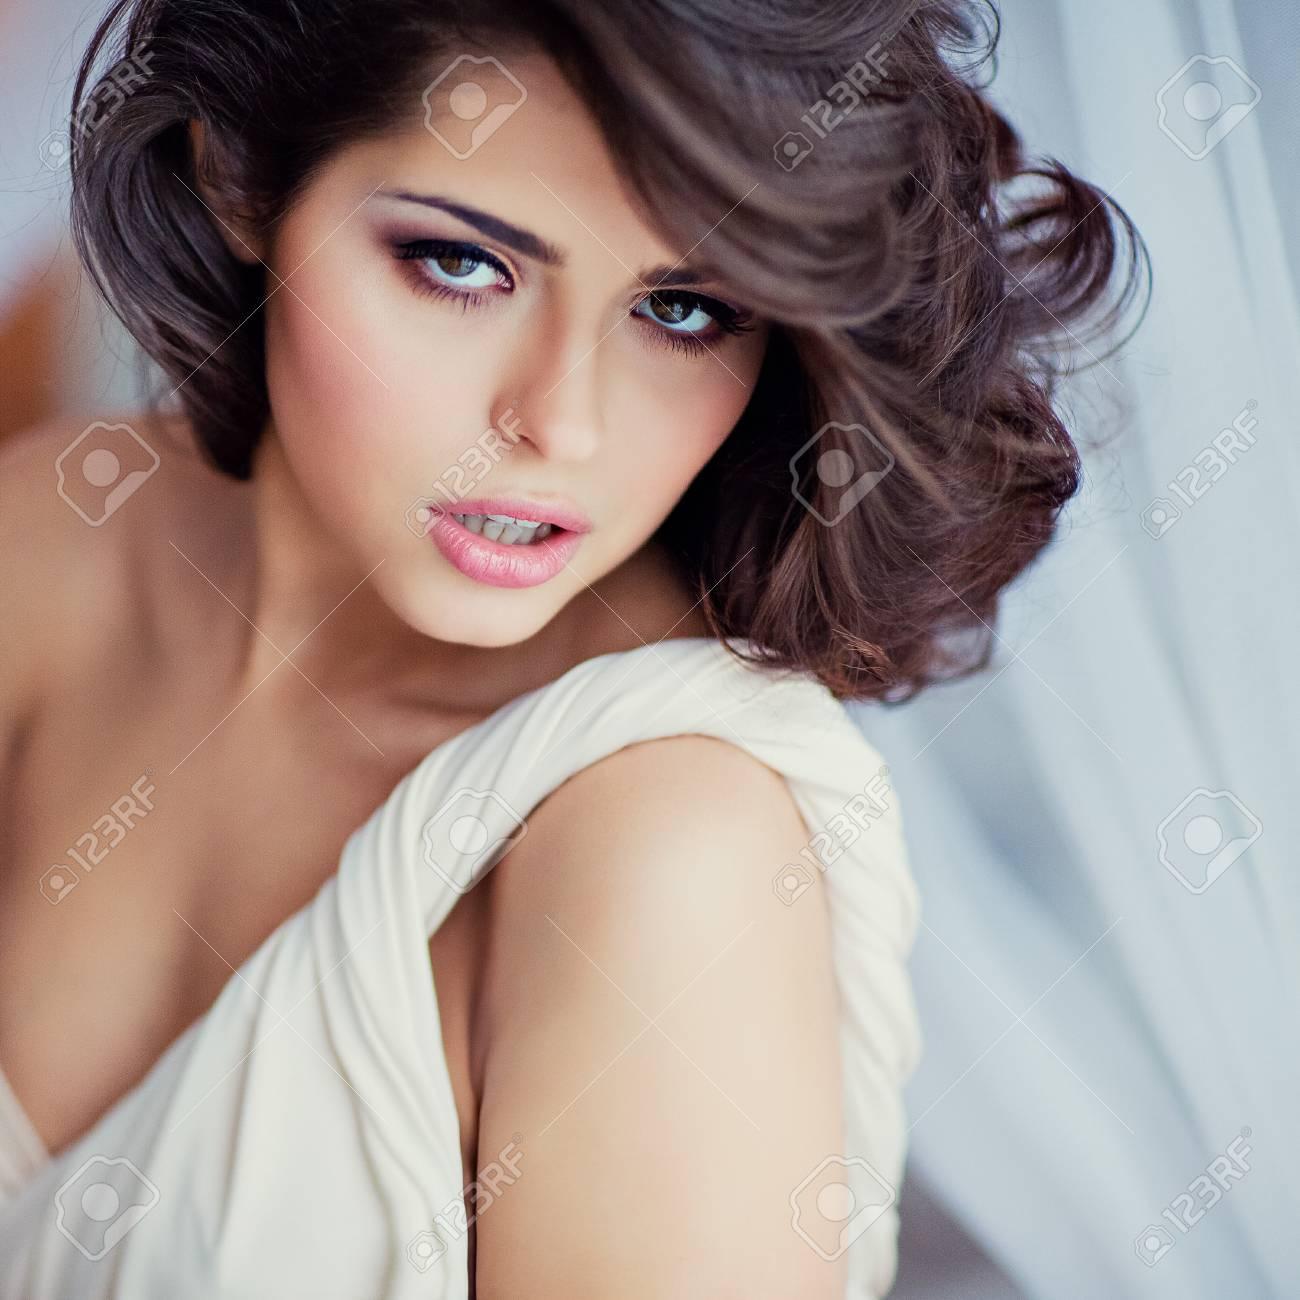 Very beautiful girl pic